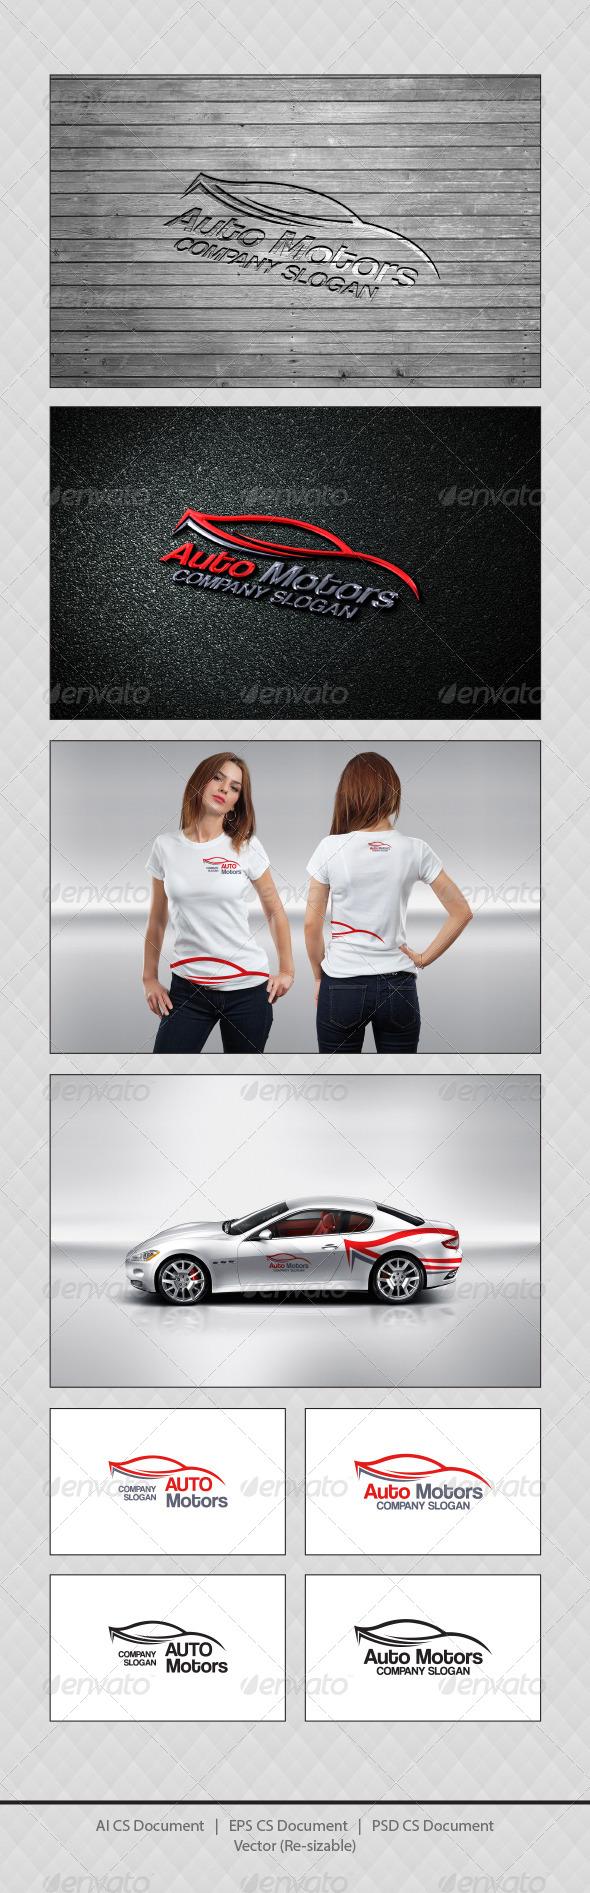 GraphicRiver Auto Motors Logo Templates 4727002